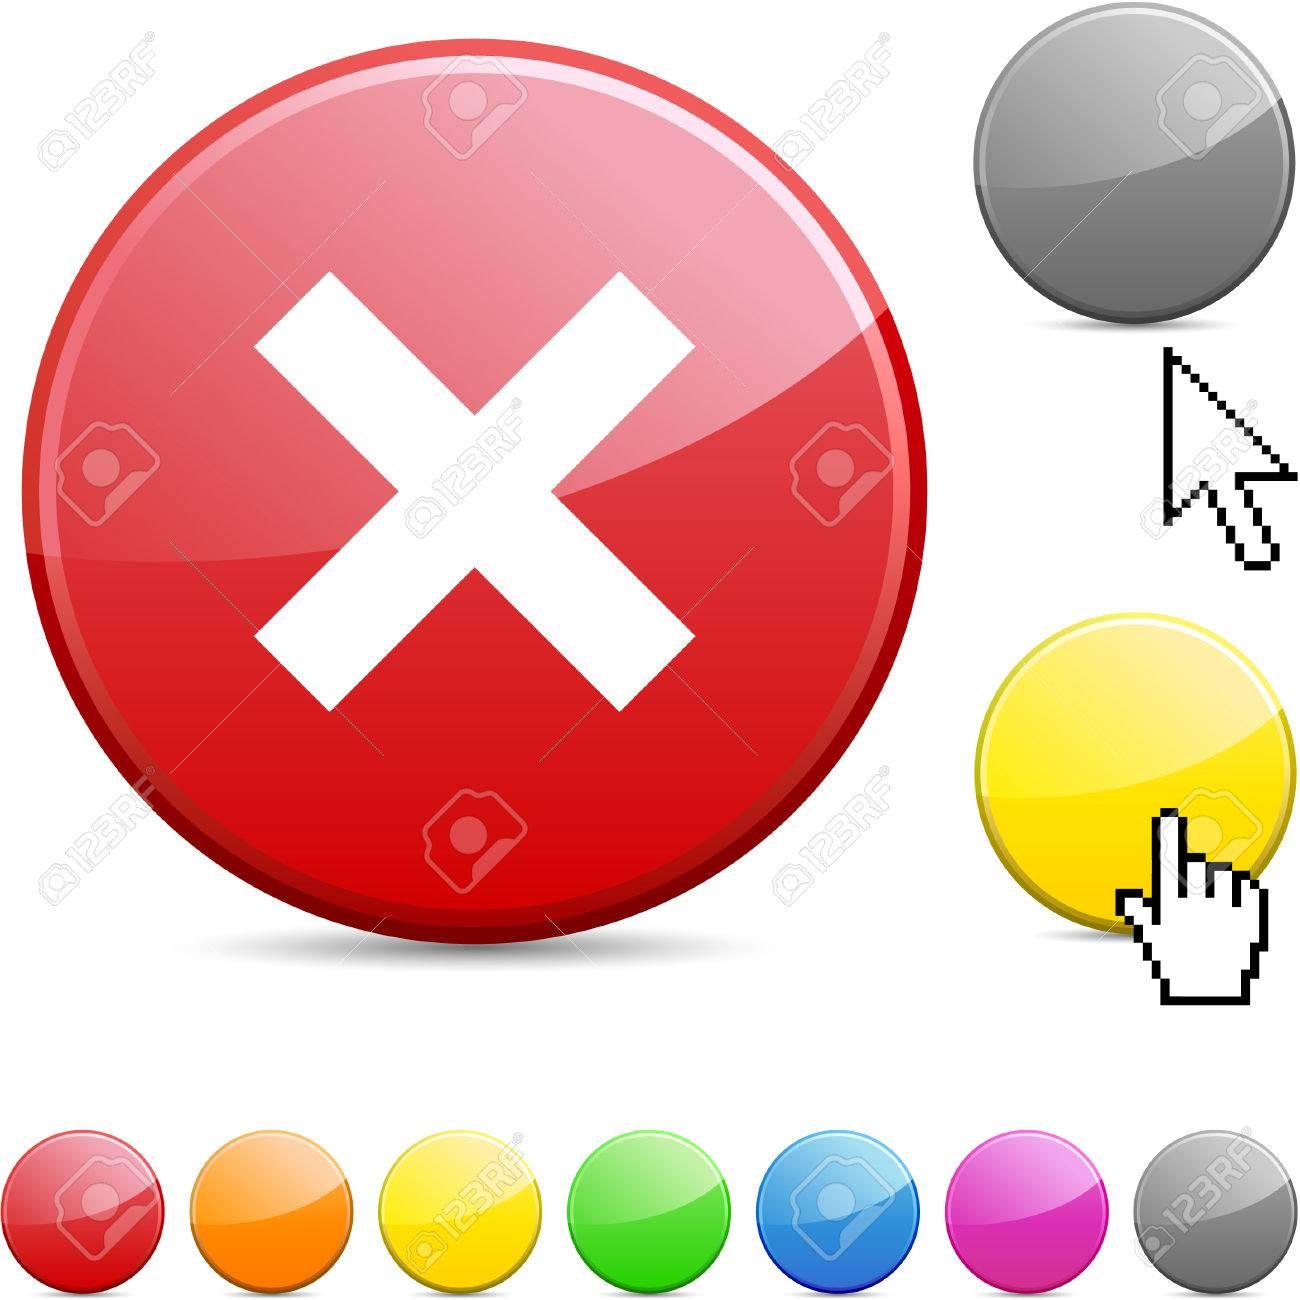 Abort glossy vibrant round icon. Stock Vector - 7168879